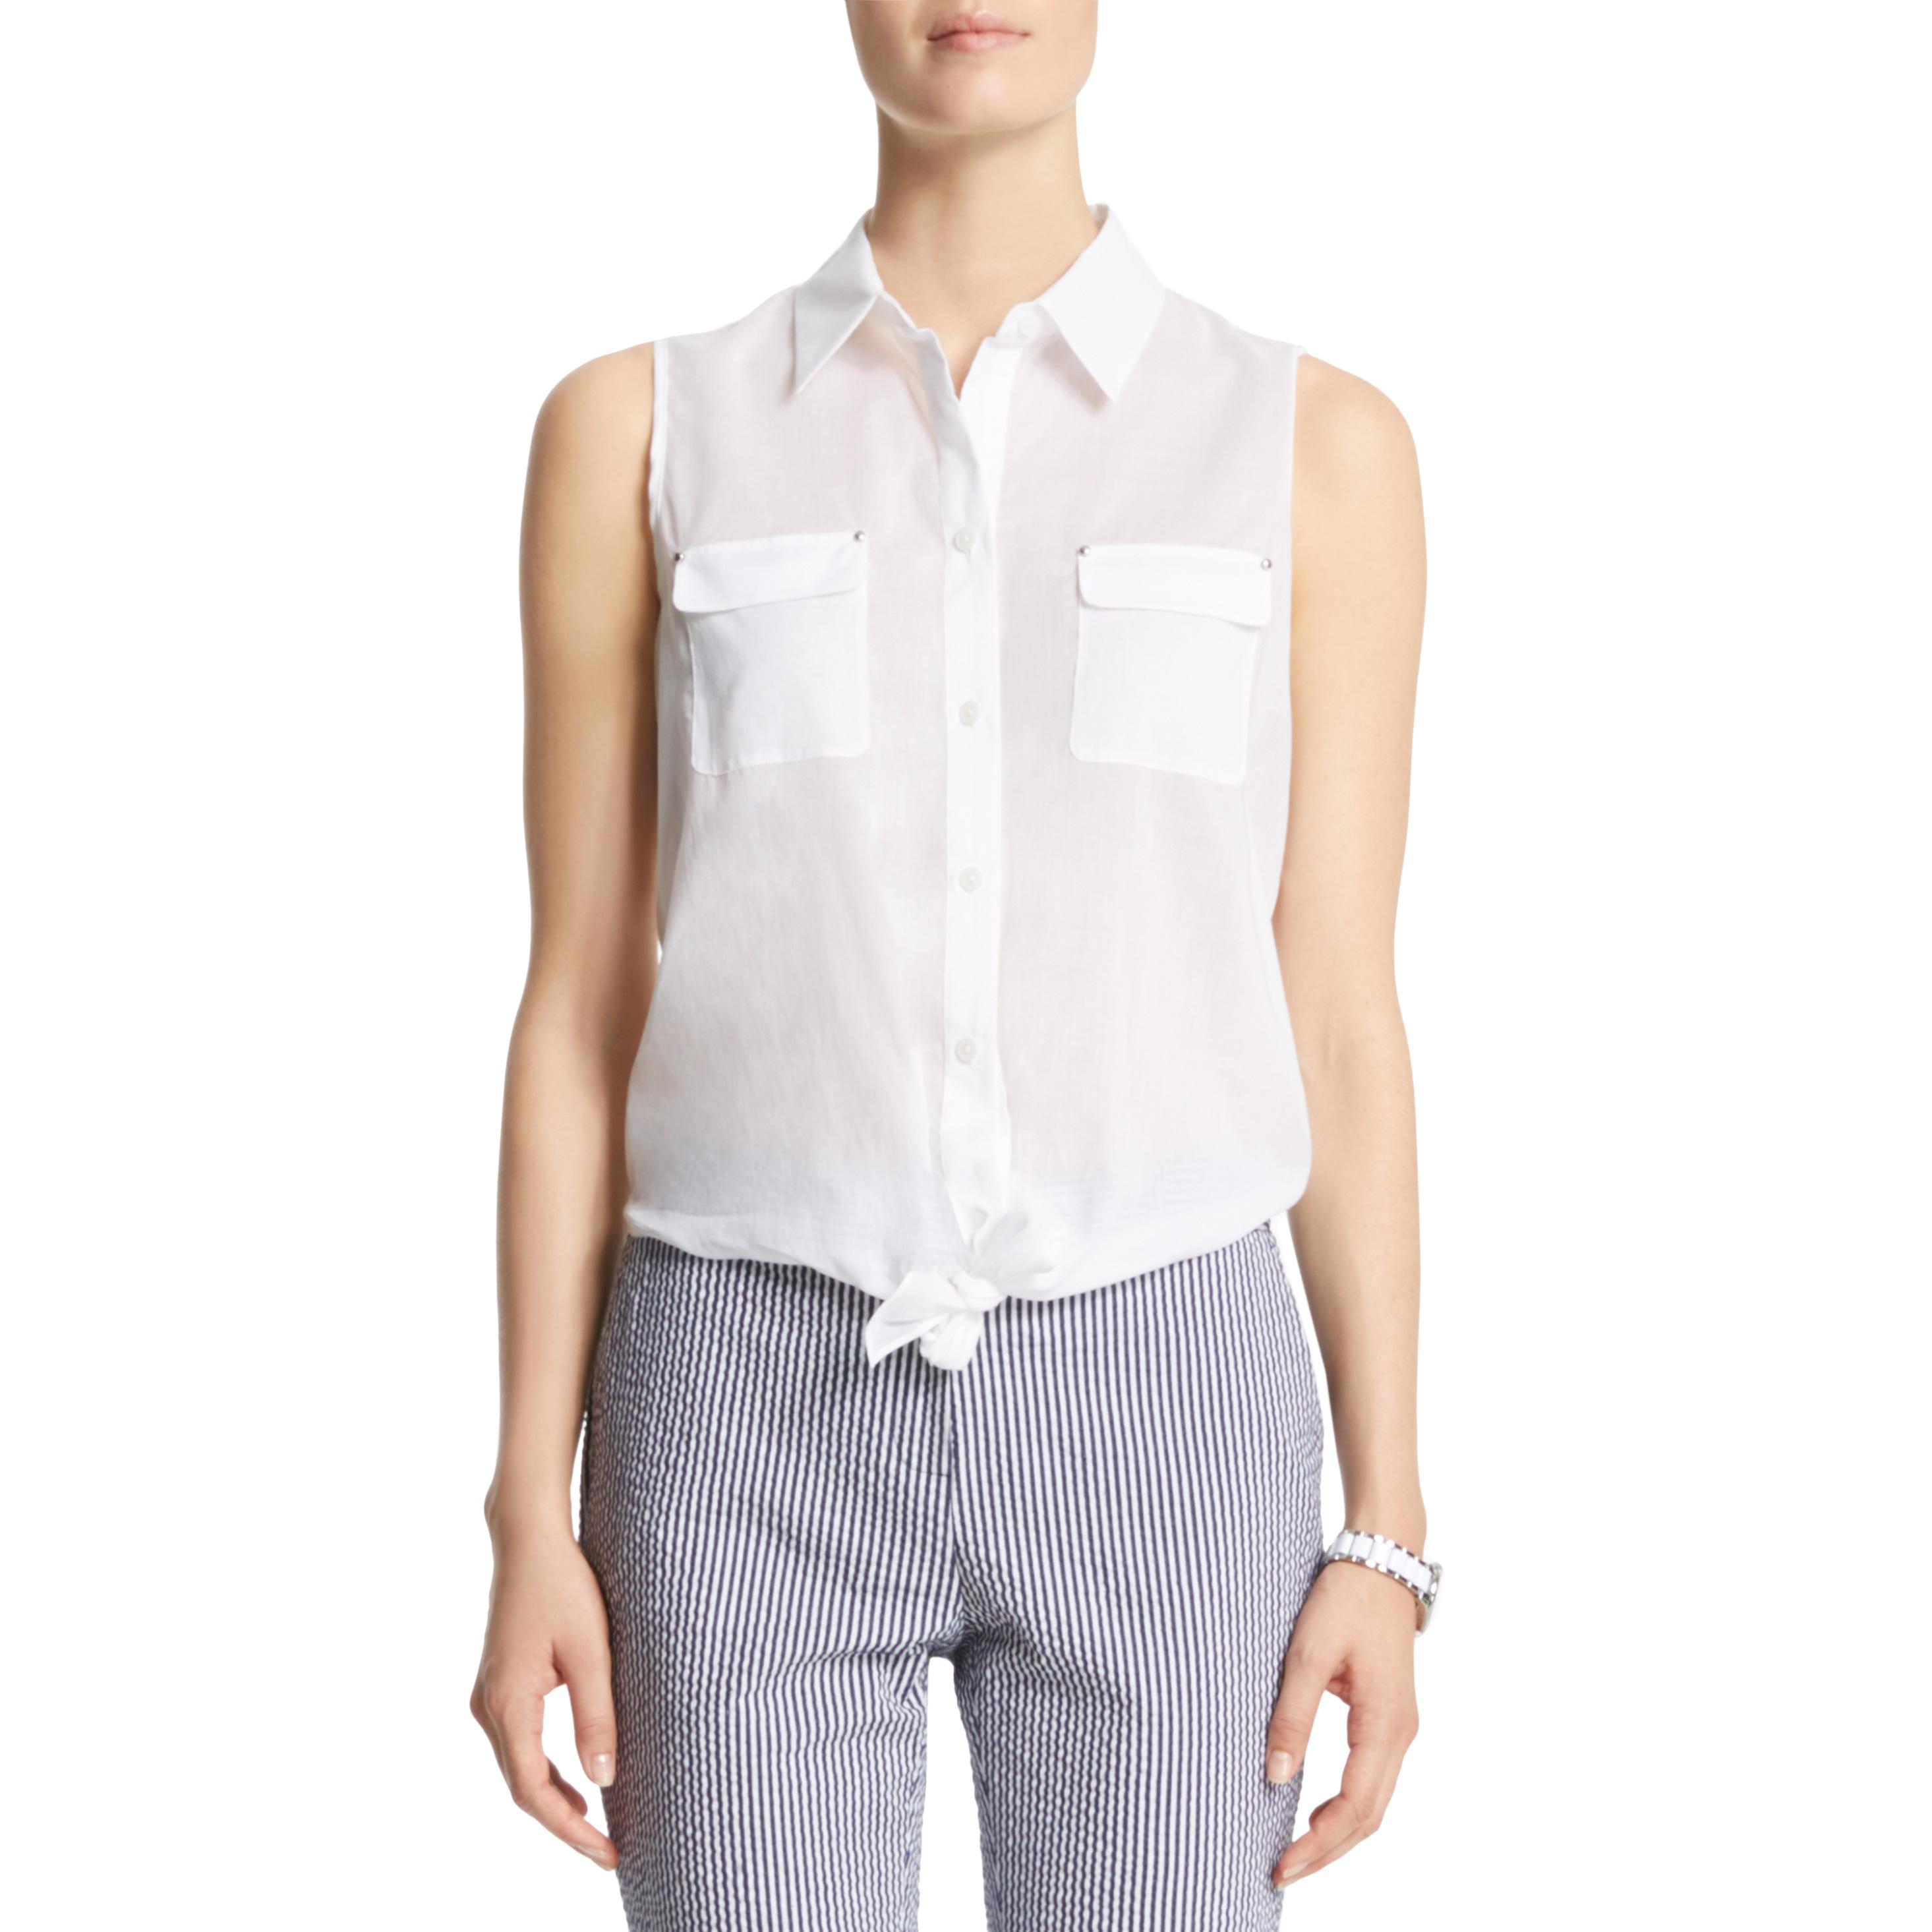 Anne klein: sleeveless tie front blouse